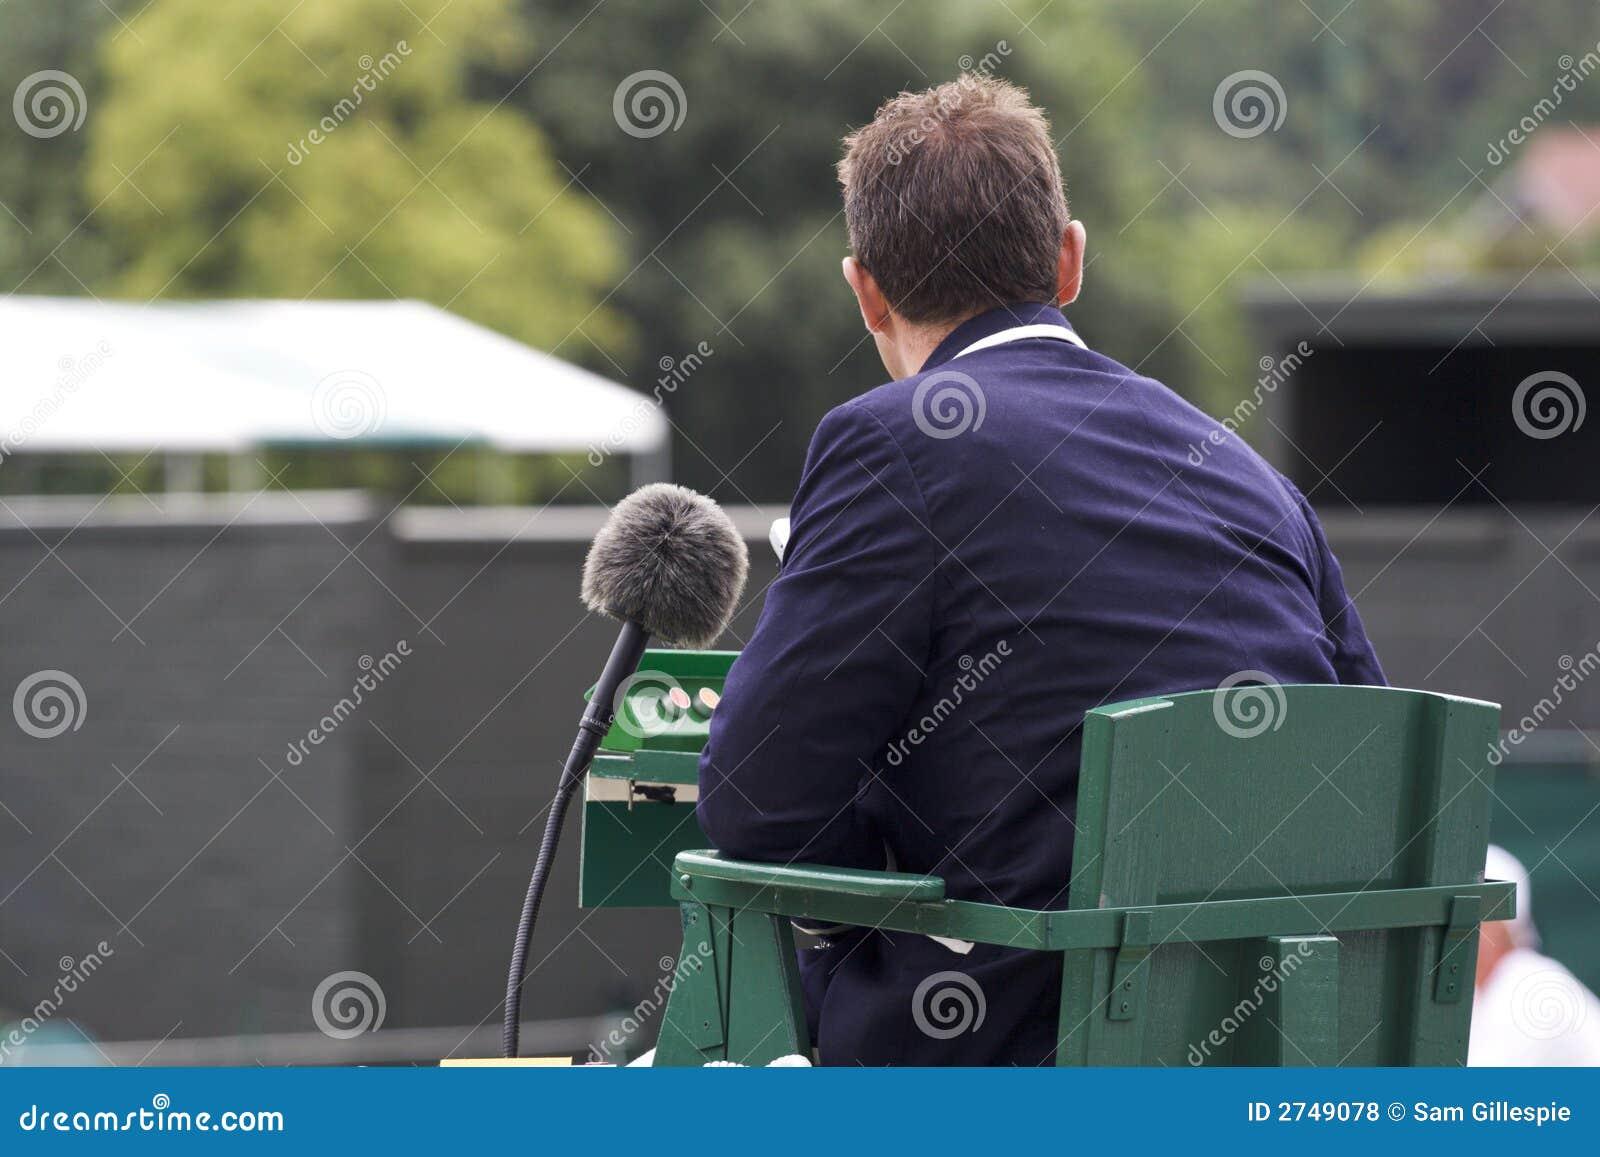 судья на вышке тенниса